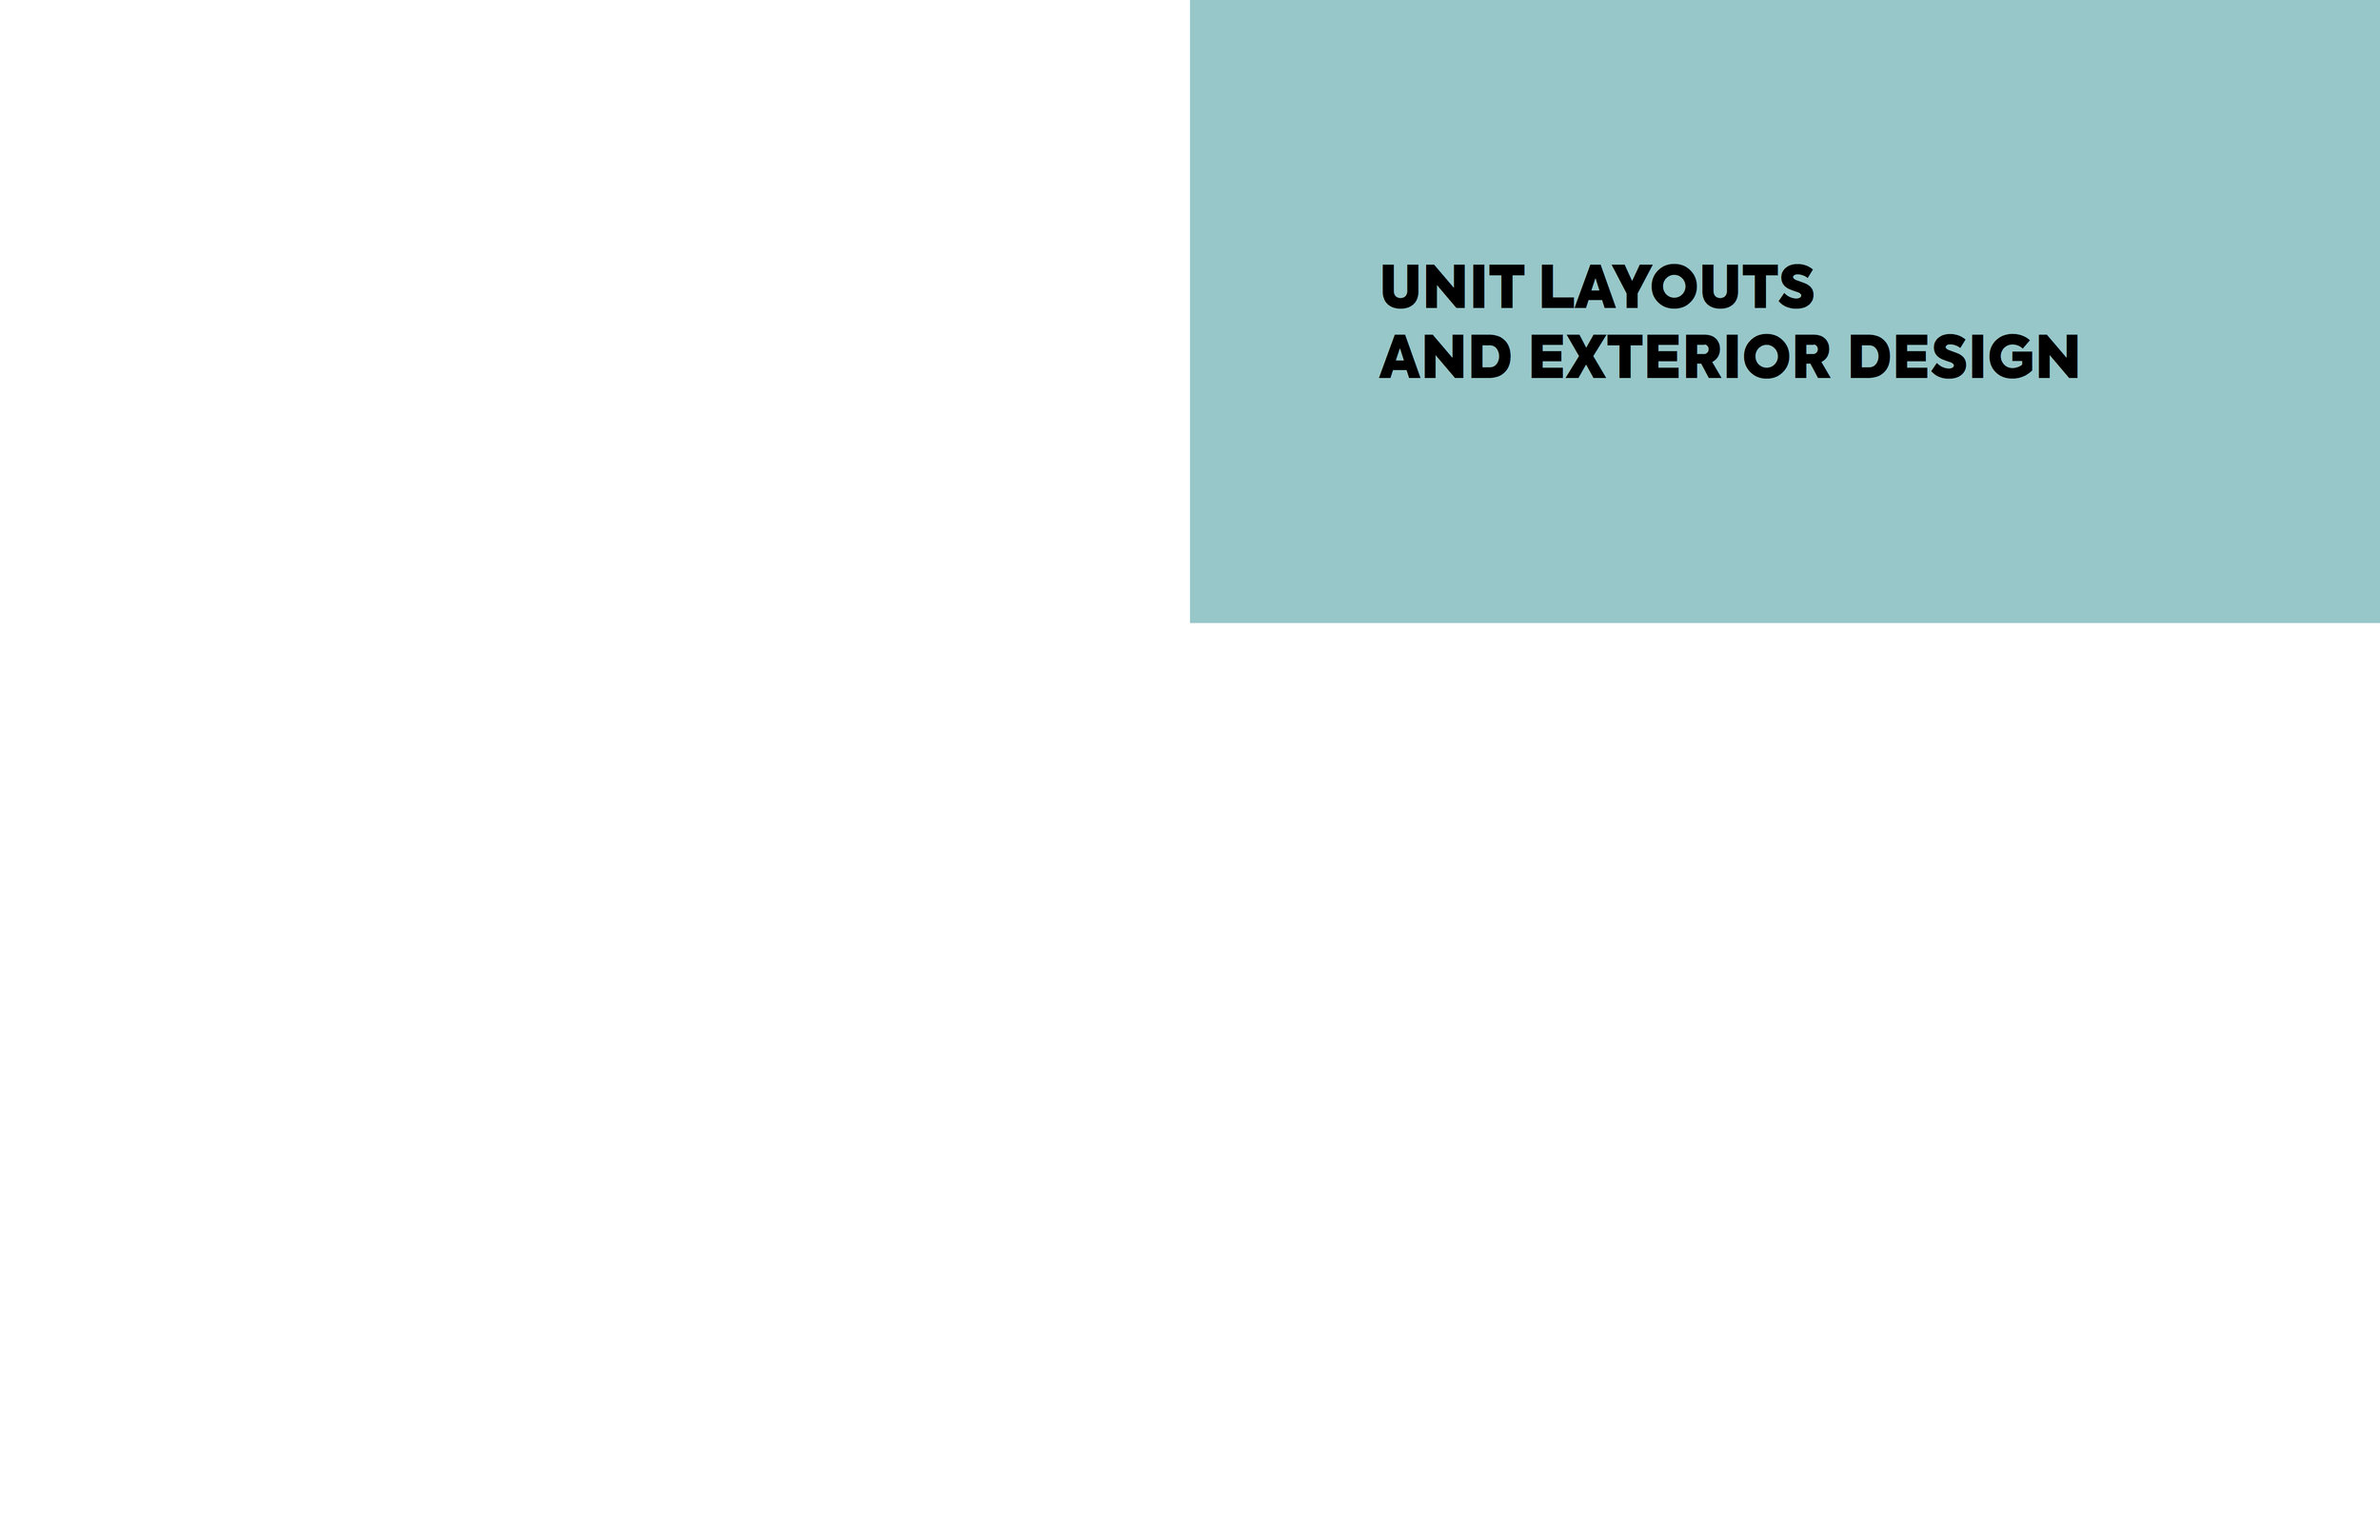 ABD Product Book Manual - 3.jpg